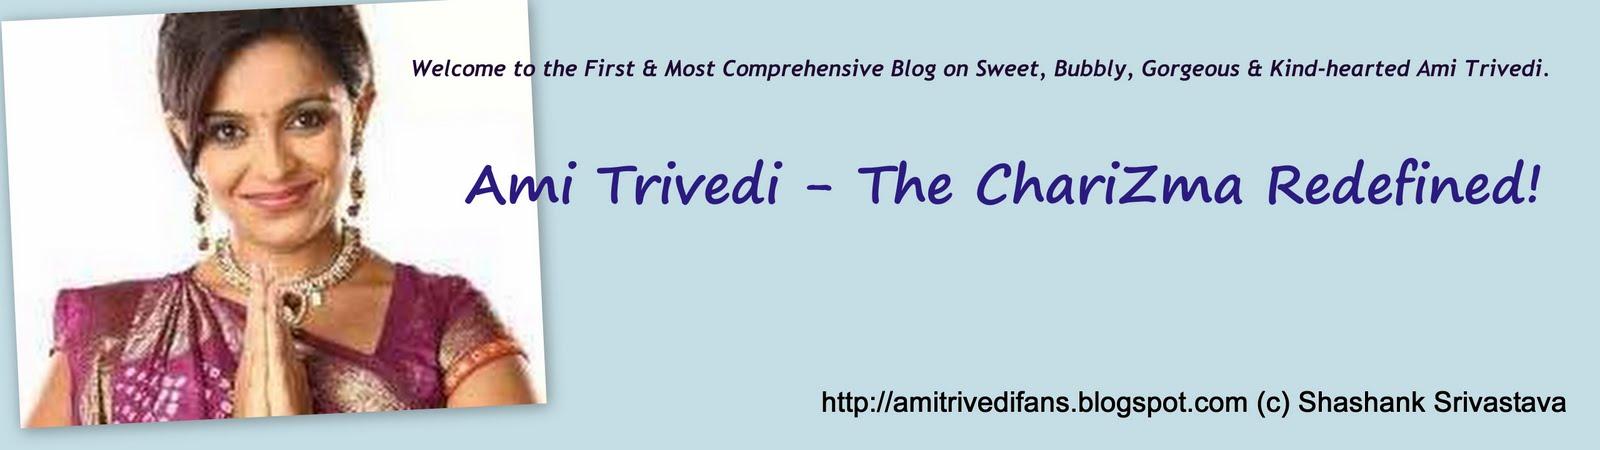 Ami Trivedi - The ChariZma Redefined!!